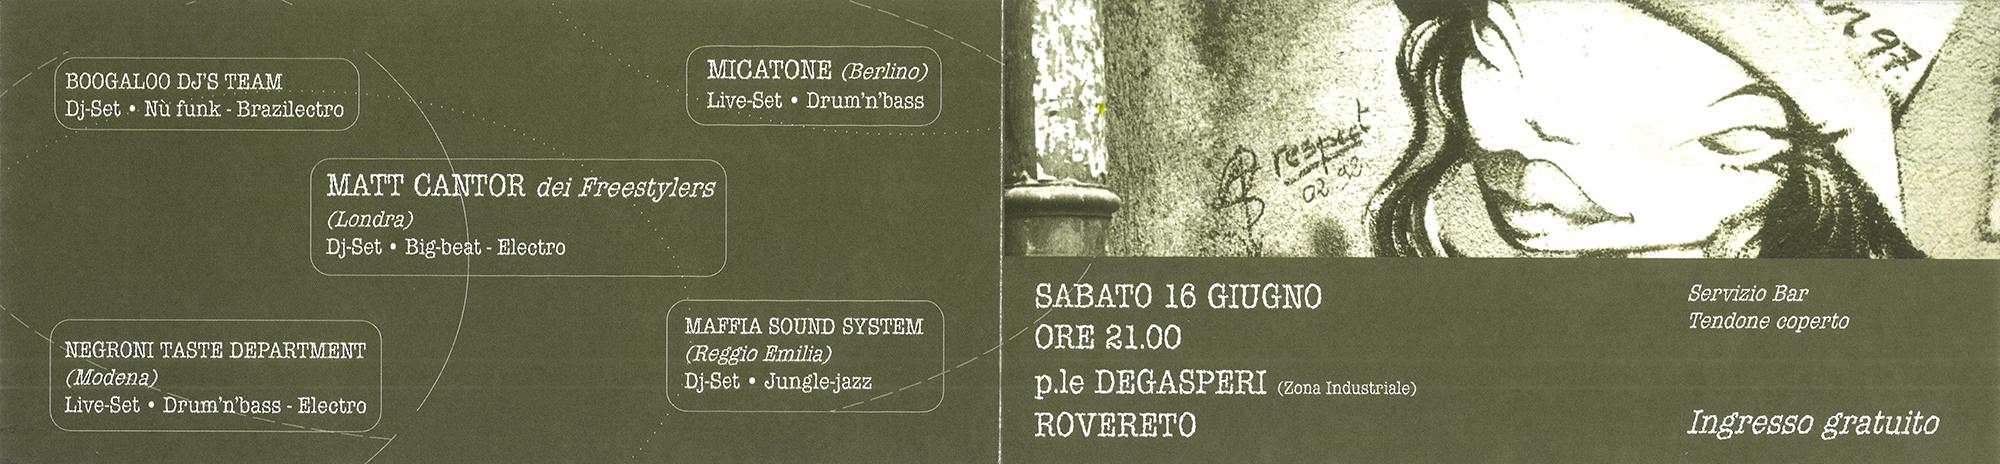 negroni-@-rovereto-festival